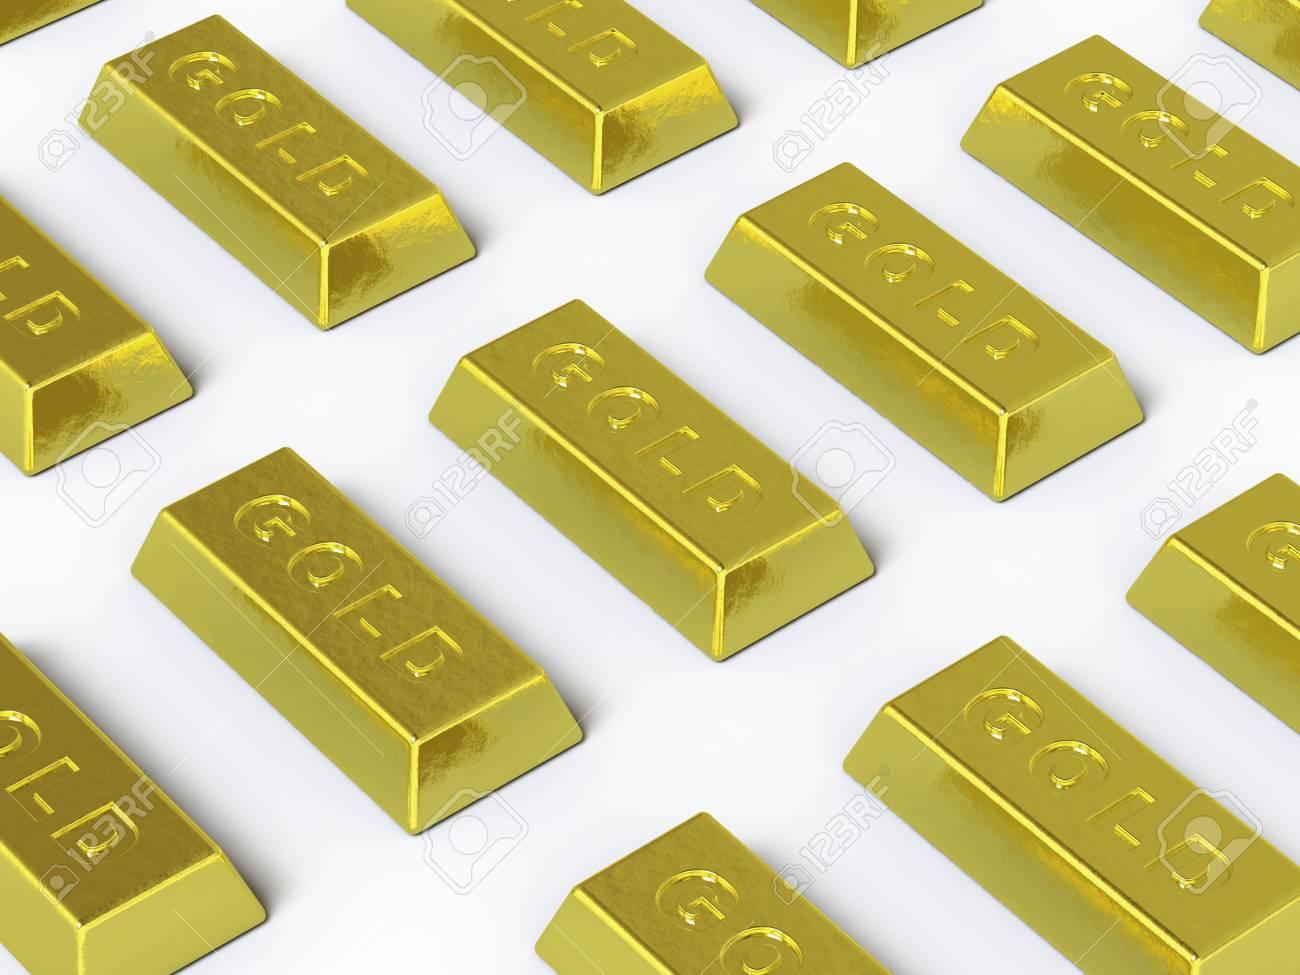 The gold ingot lies on a white surface Stock Photo - 5193000